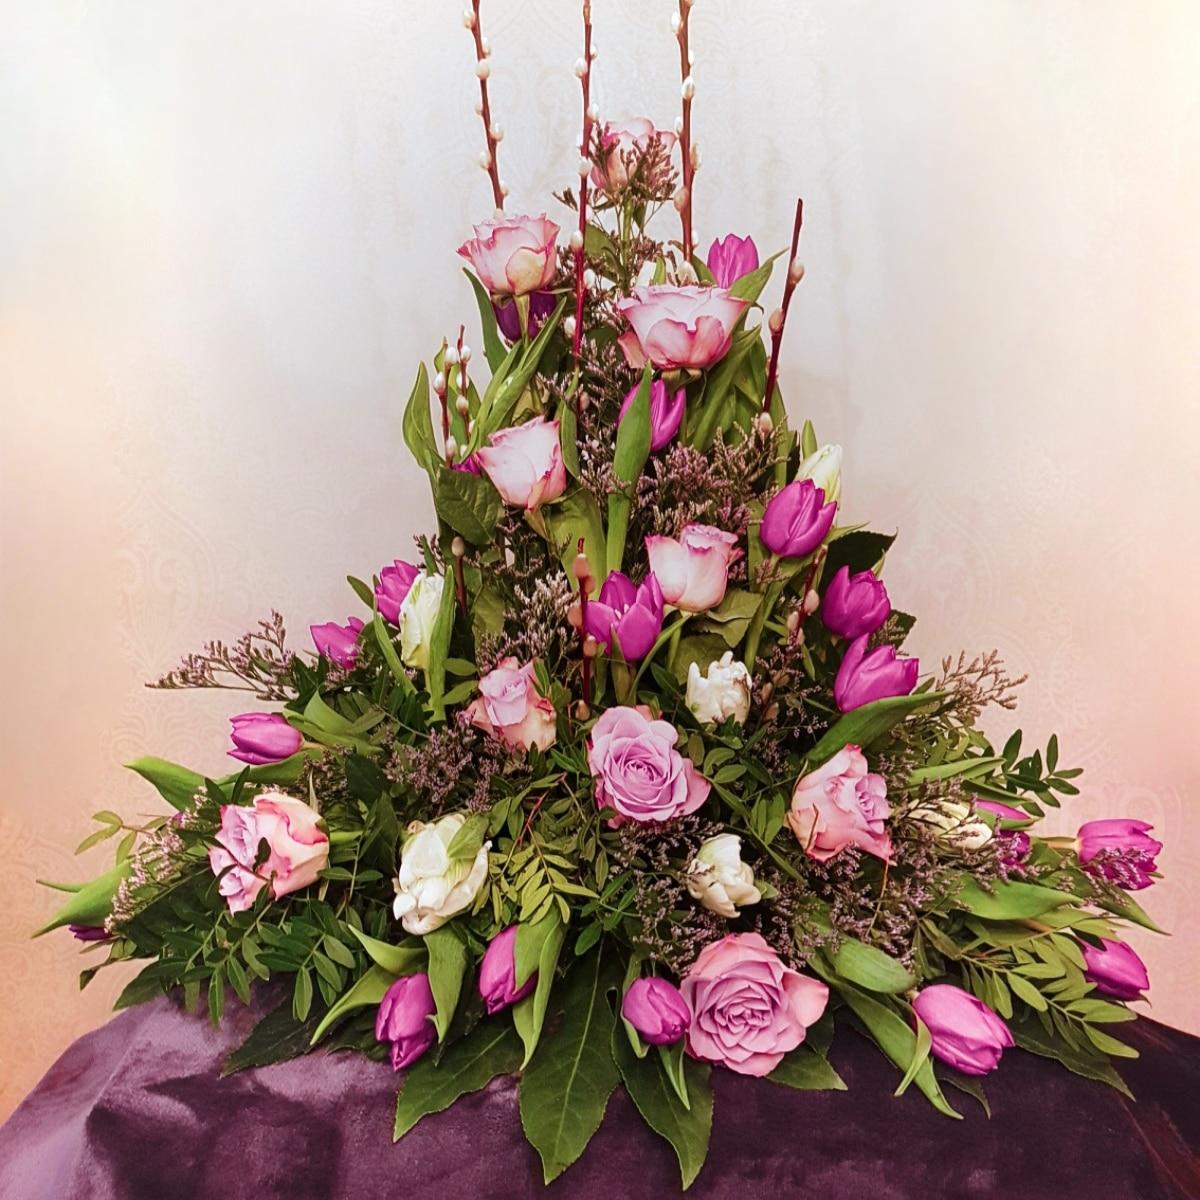 Evighetens Vila Begravningsbyrå Stående Blomsterarrangemang